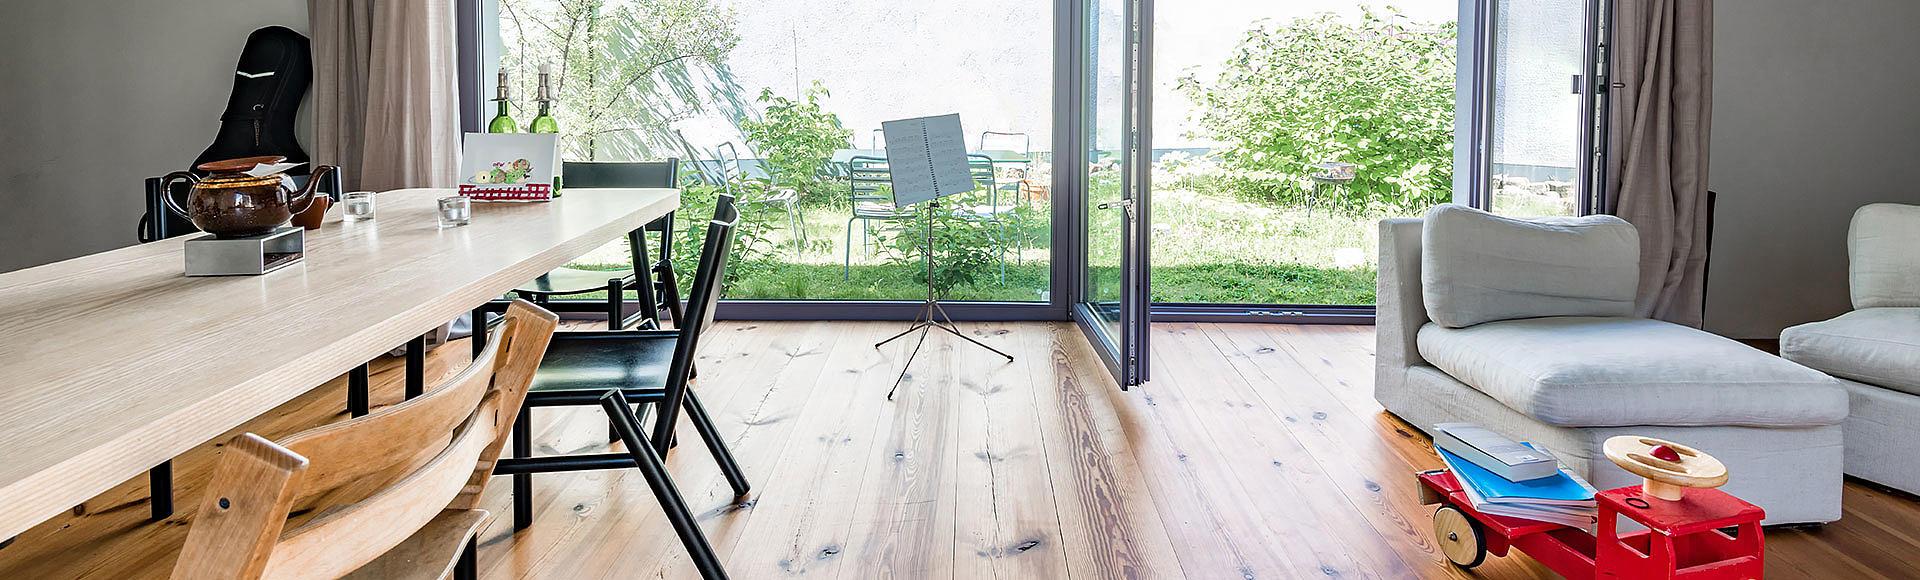 Böden Bauelemente Terrasse Landsberg Am Lech Kaufbeuren